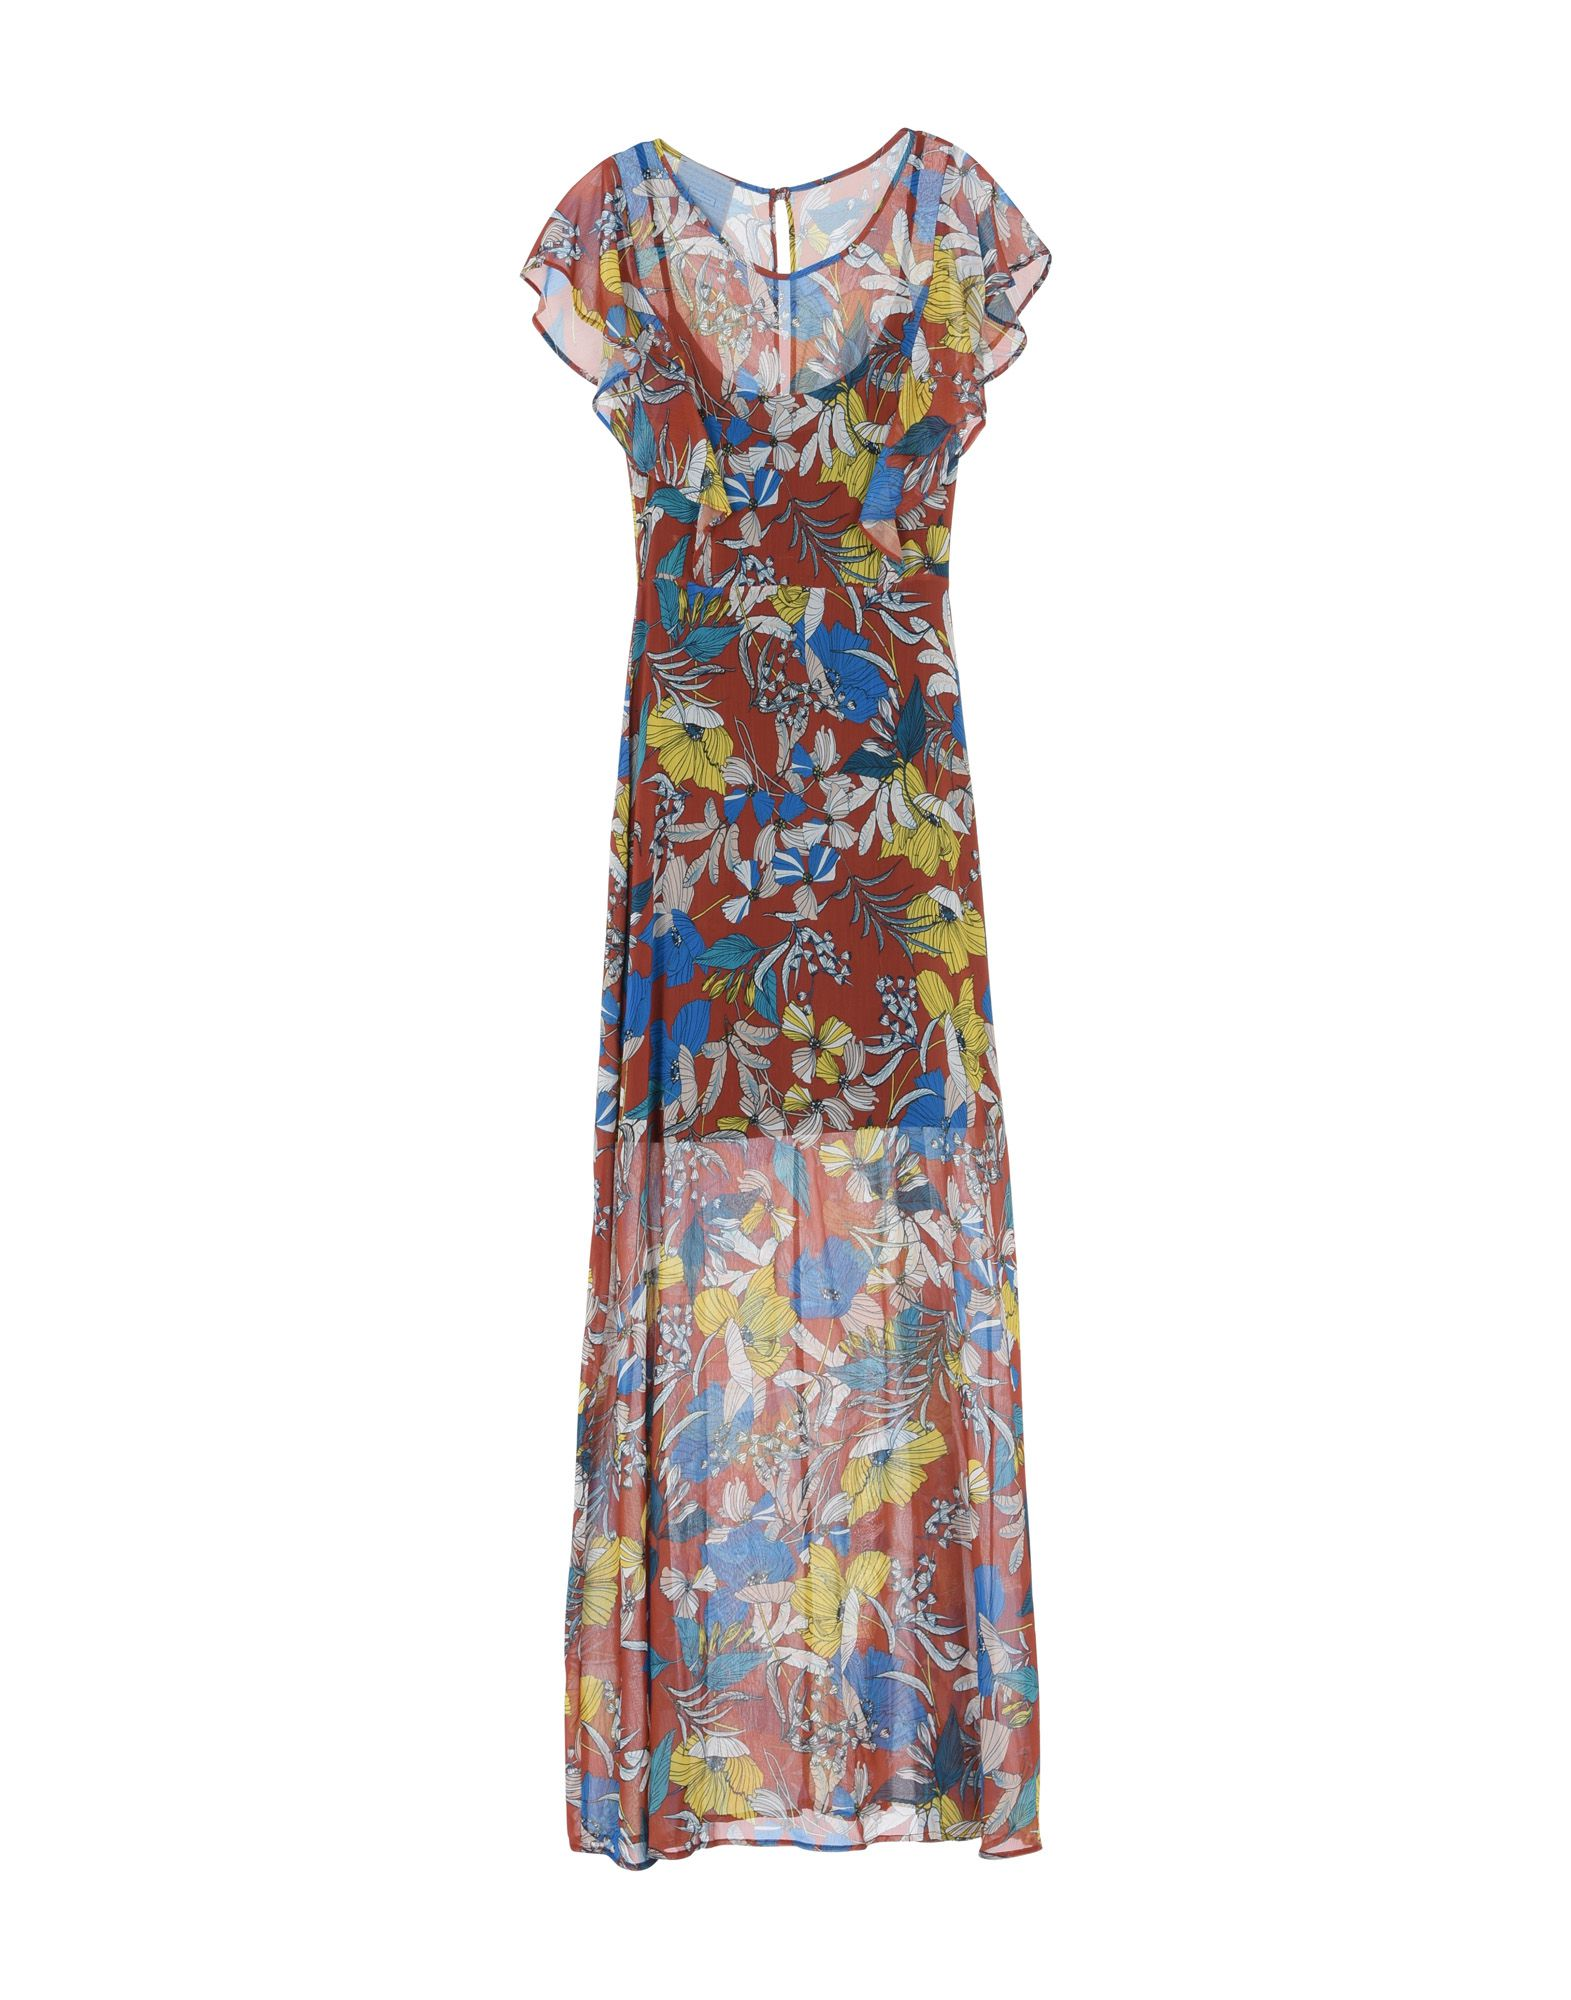 MIA SULIMAN Длинное платье туники сарафаны mia mia платье leona цвет синий l page 7